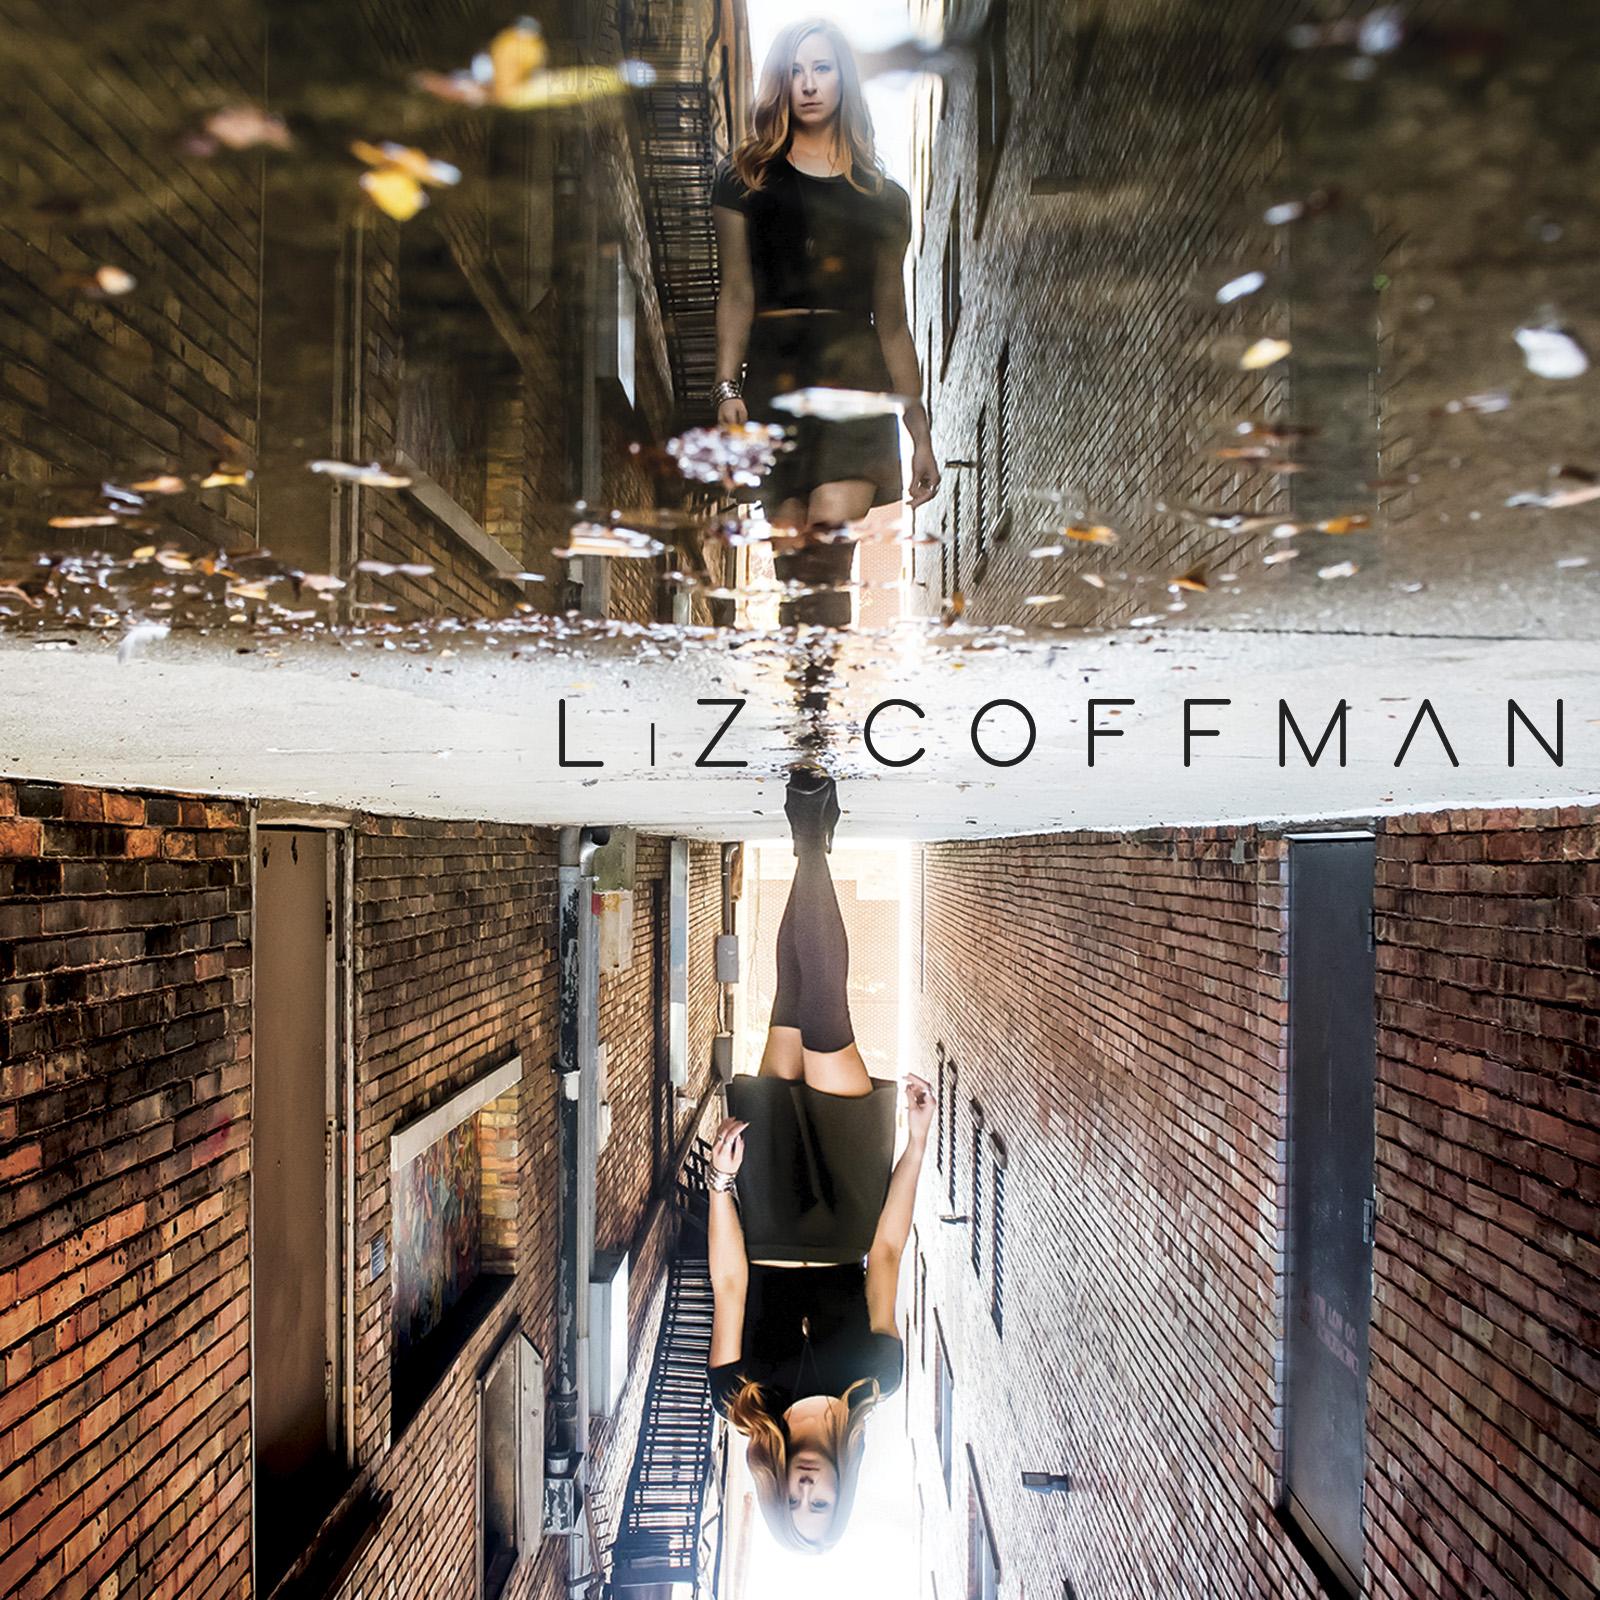 LizCoffmanCD_2018_Cover_1600x1600.jpg